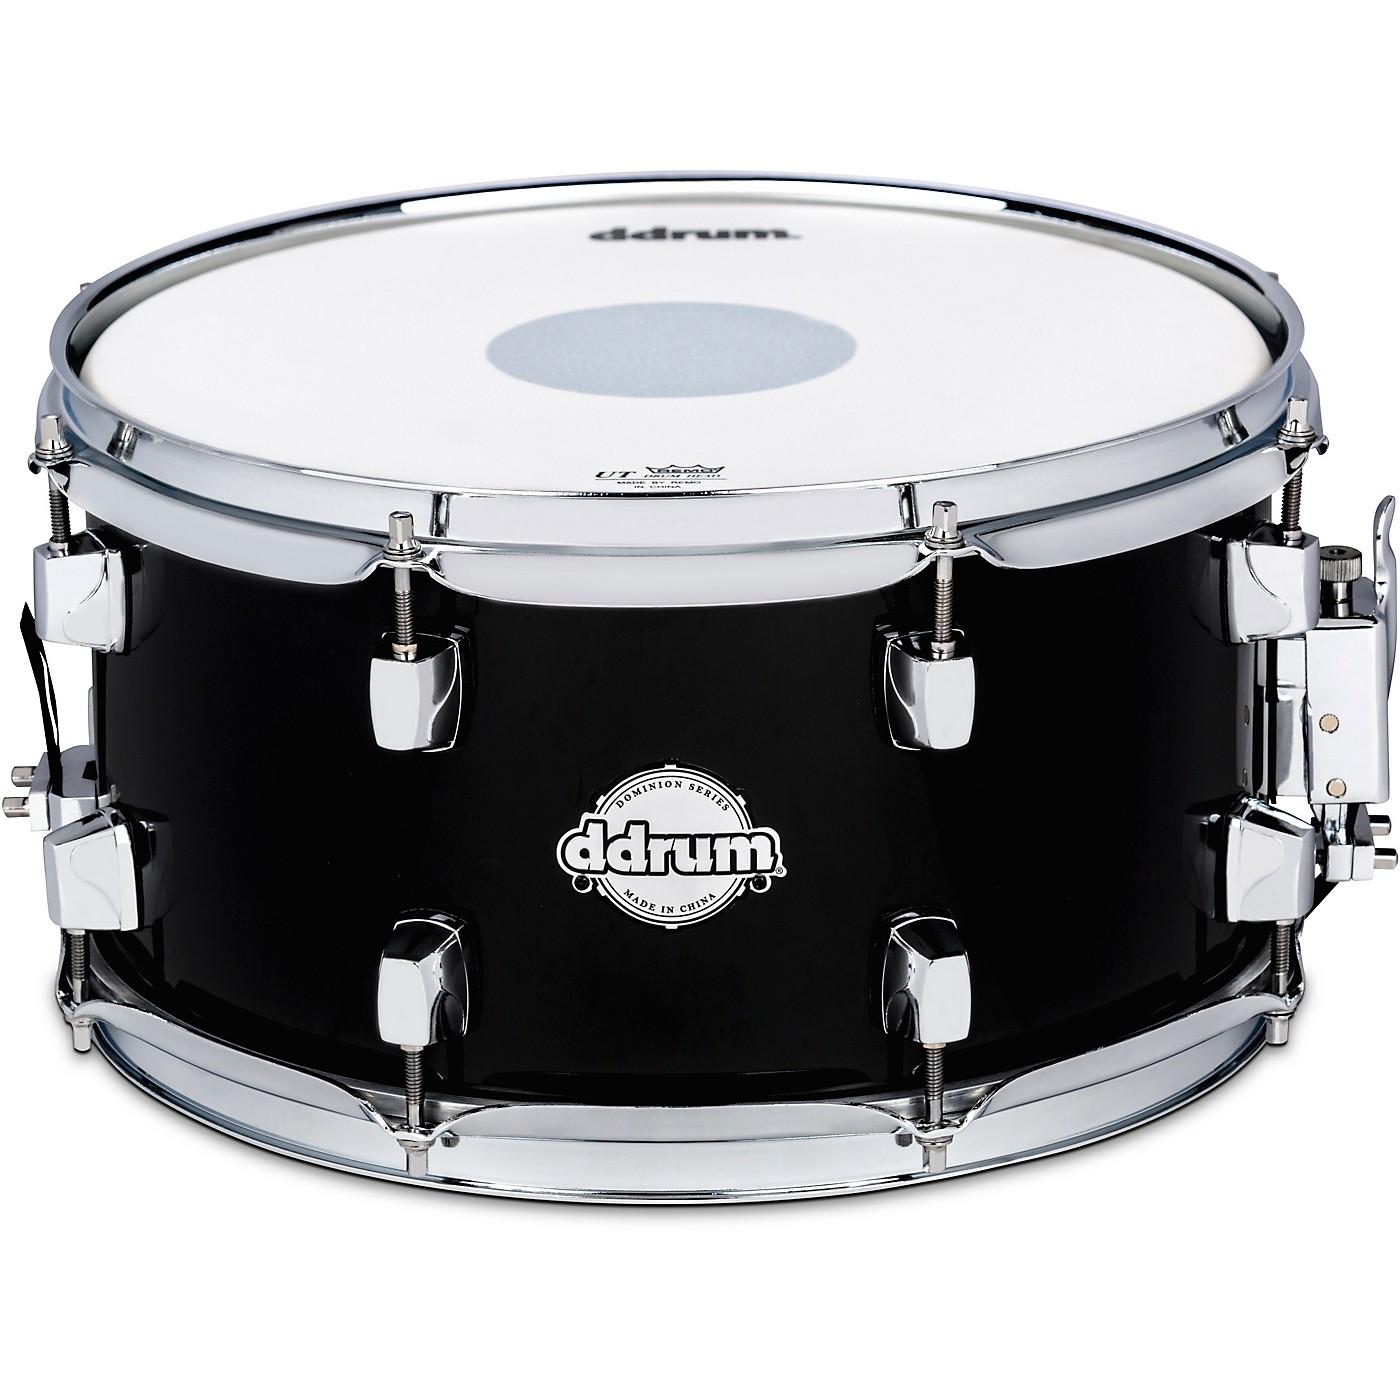 ddrum Dominion Birch Snare Drum thumbnail